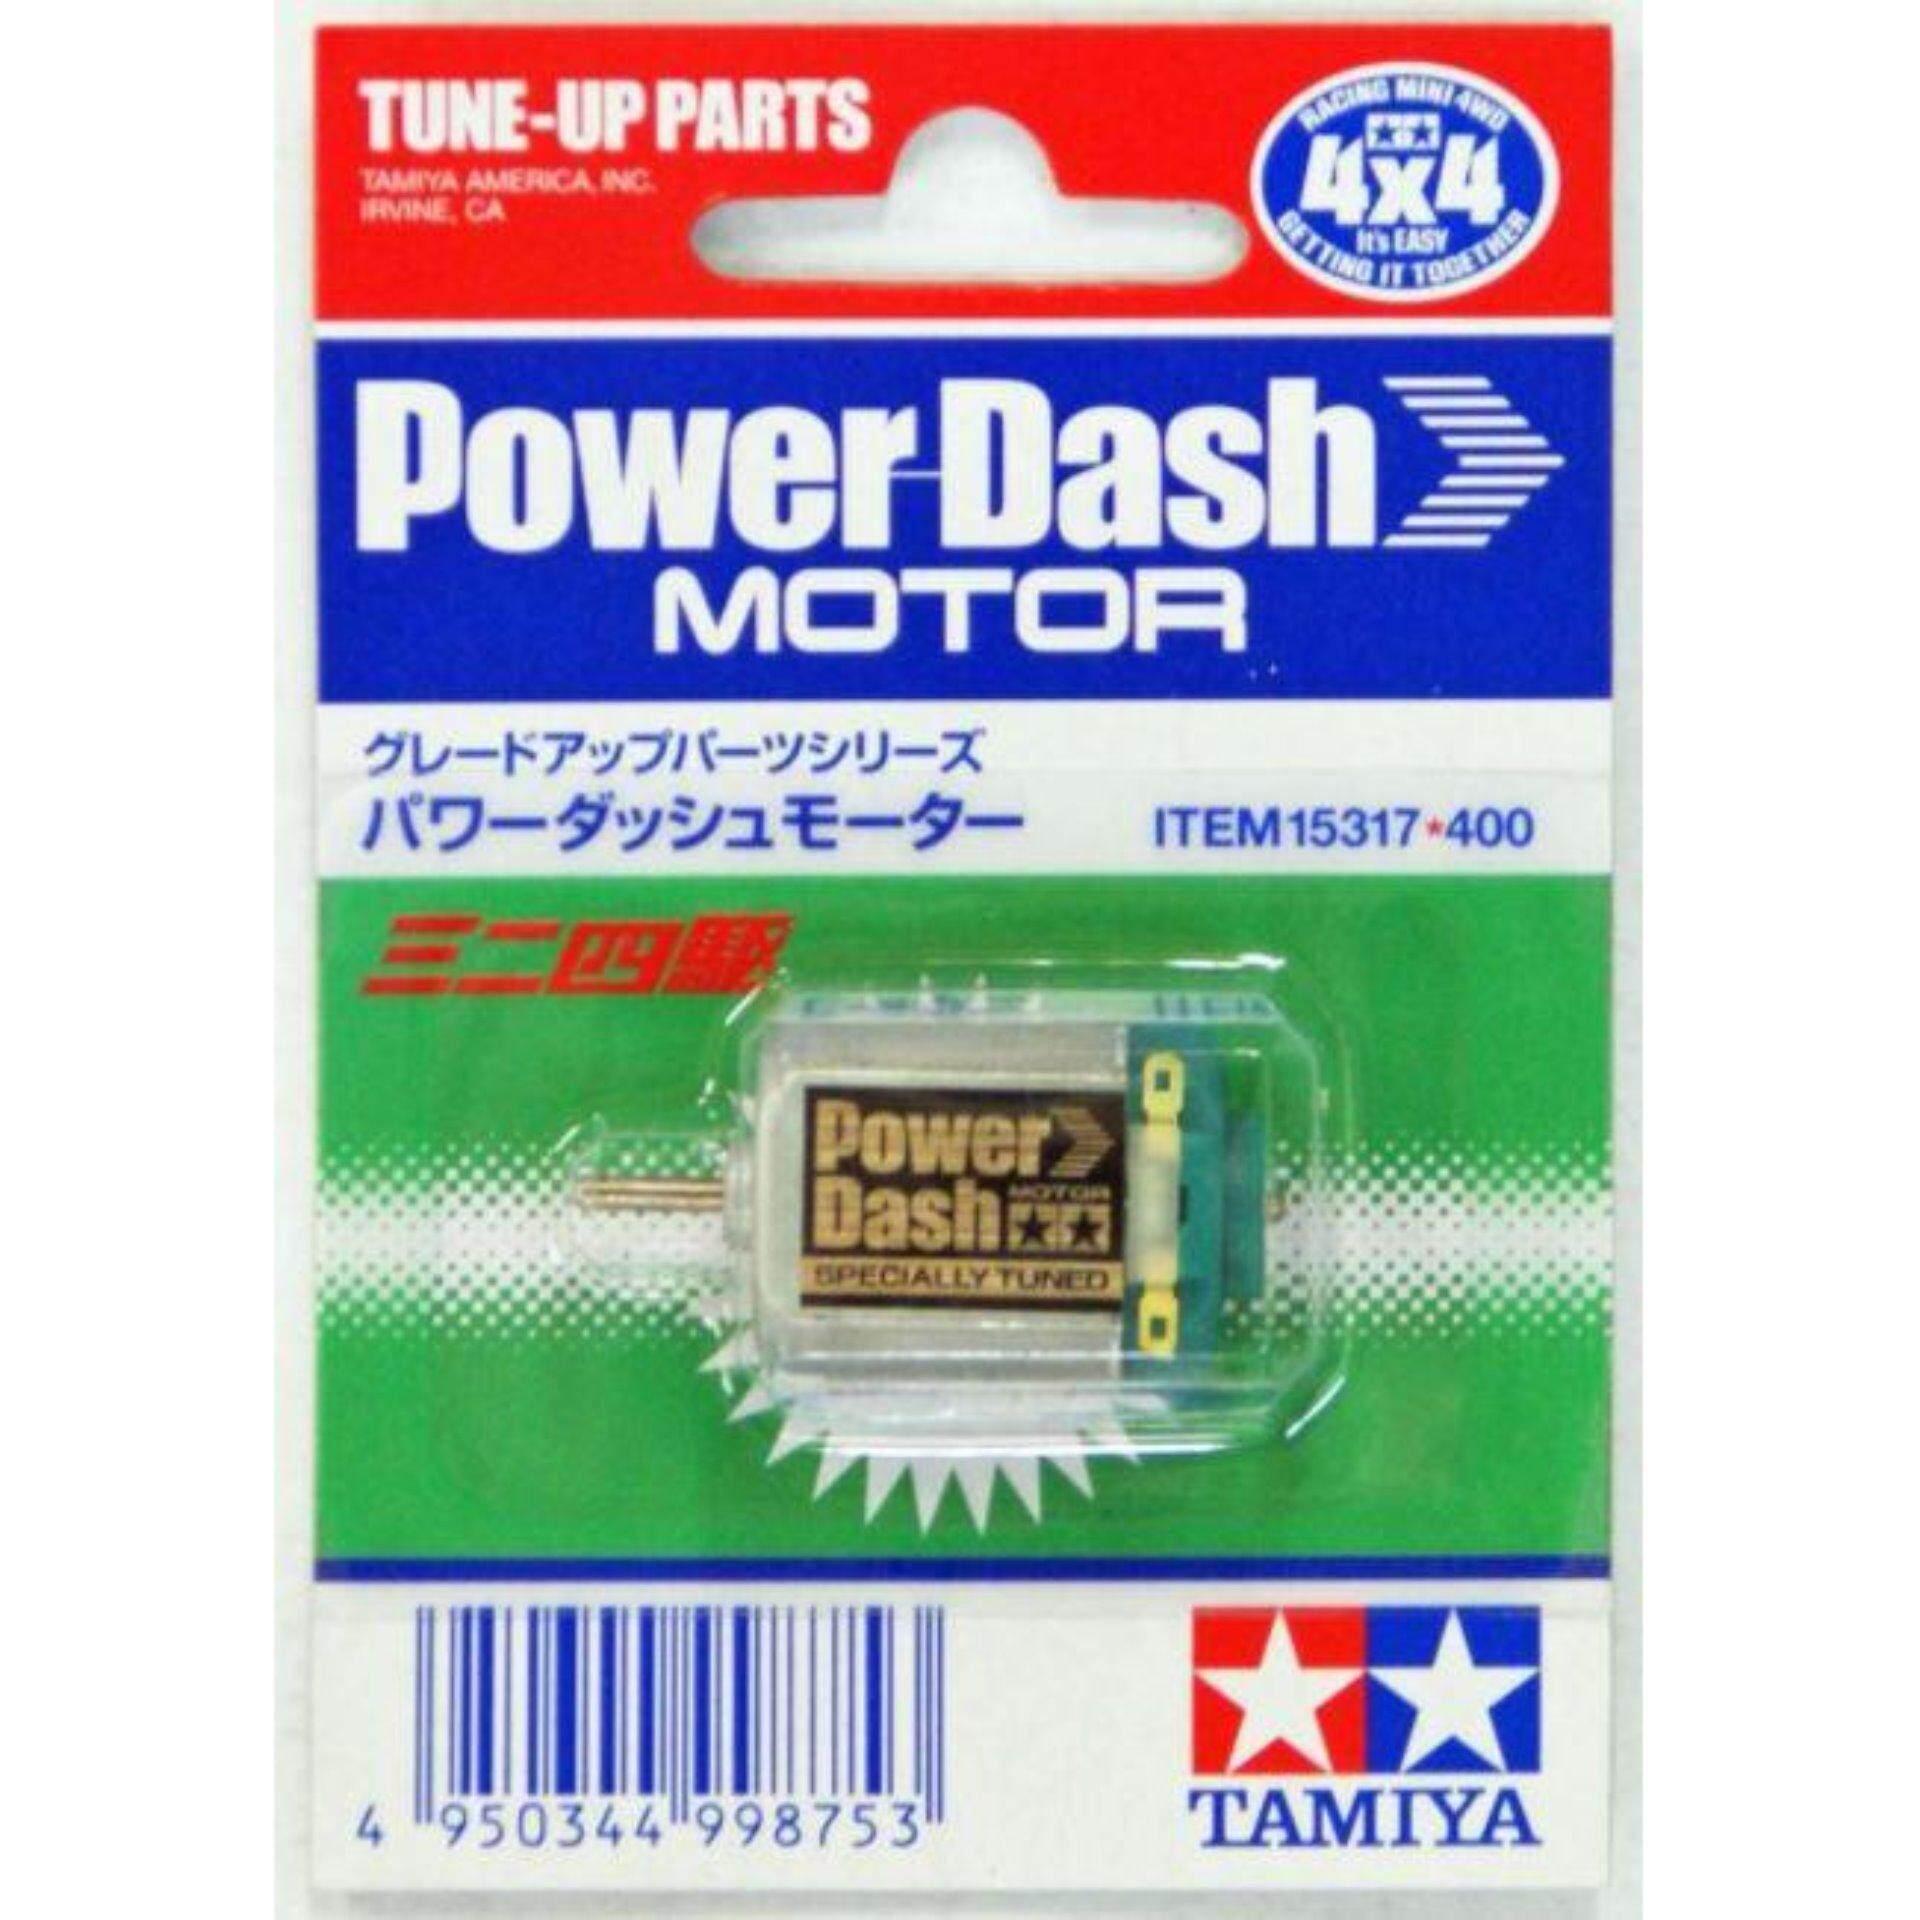 TAMIYA Power Dash Motor SPECIAL TUNED